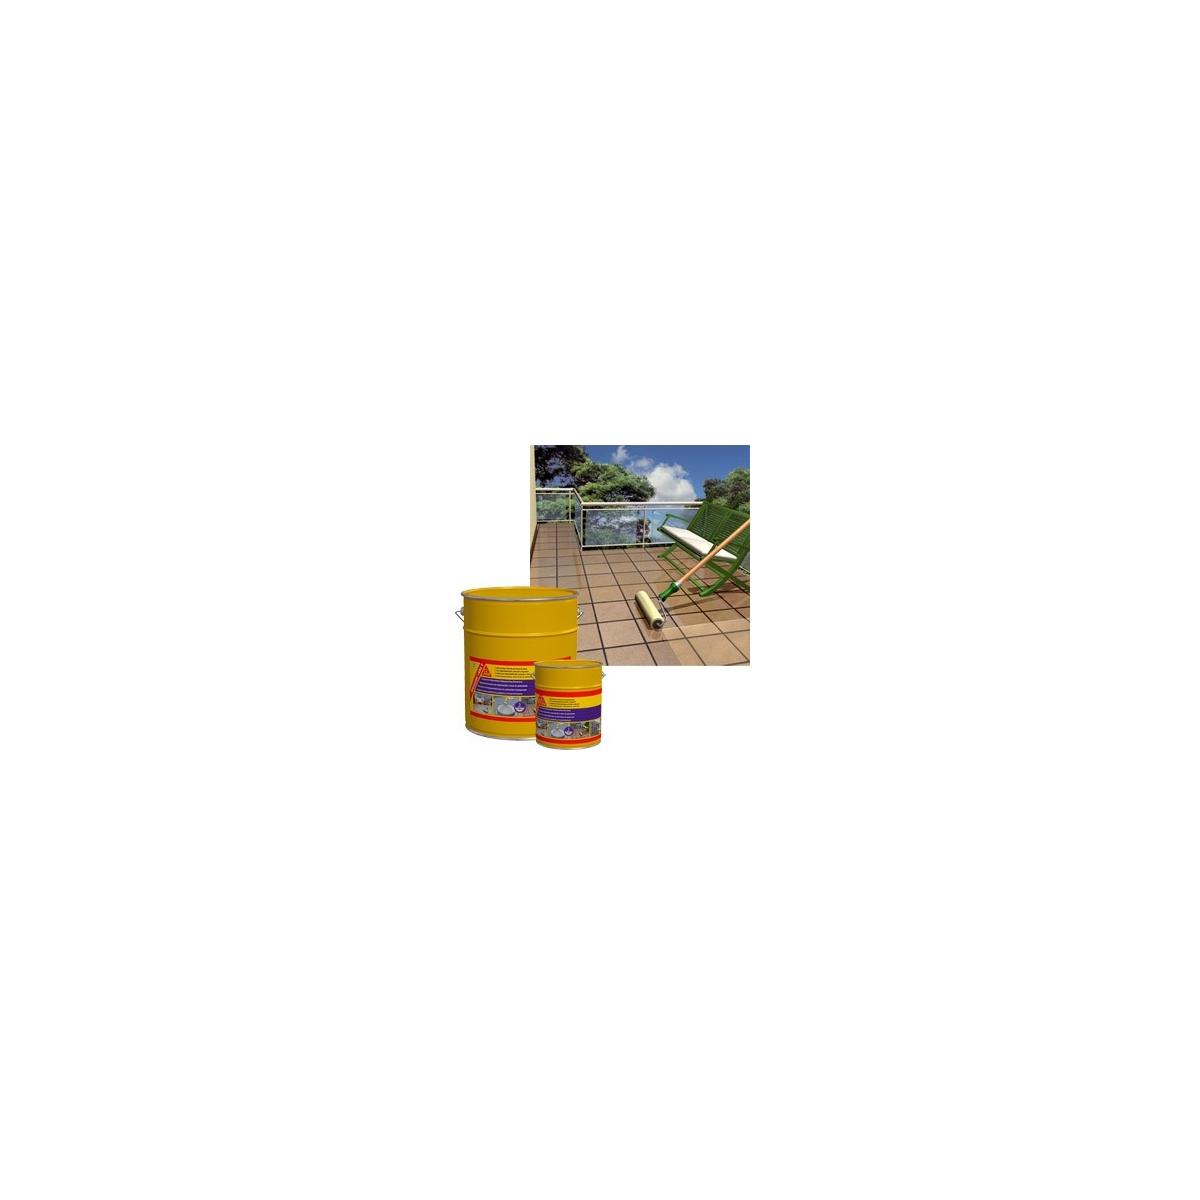 Sikalastic 495t Membrana líquida impermeable